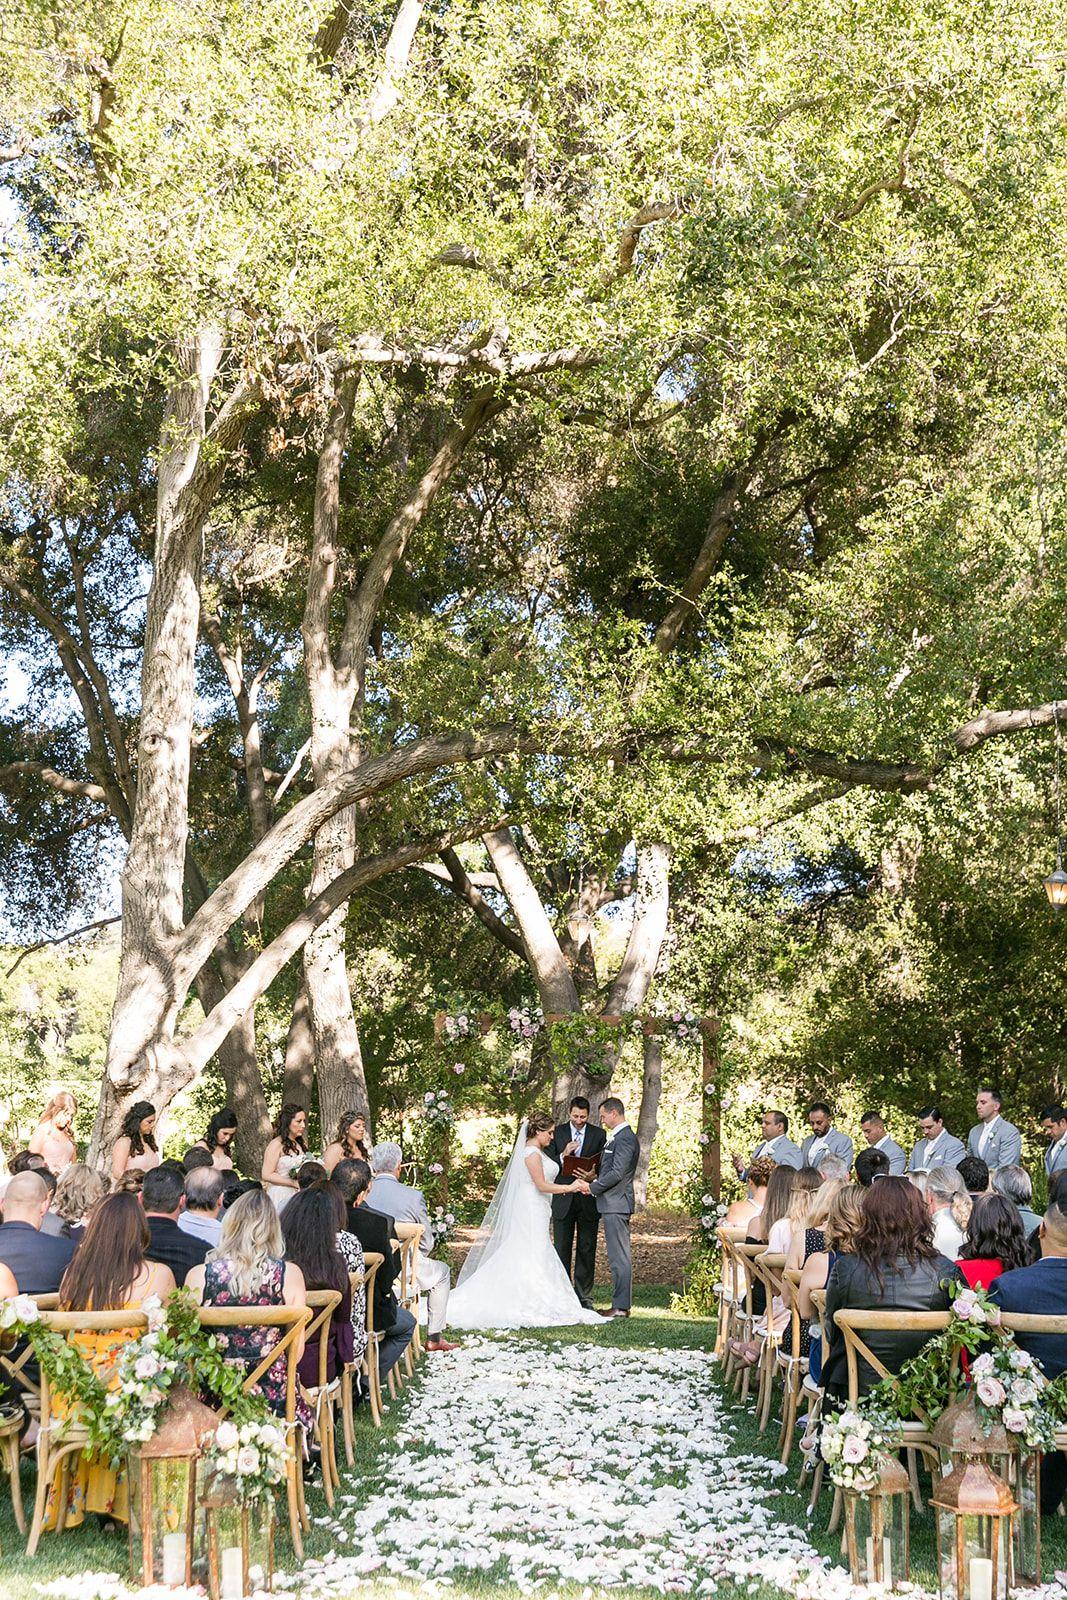 Temecula Creek Inn wedding venue in Temecula, California